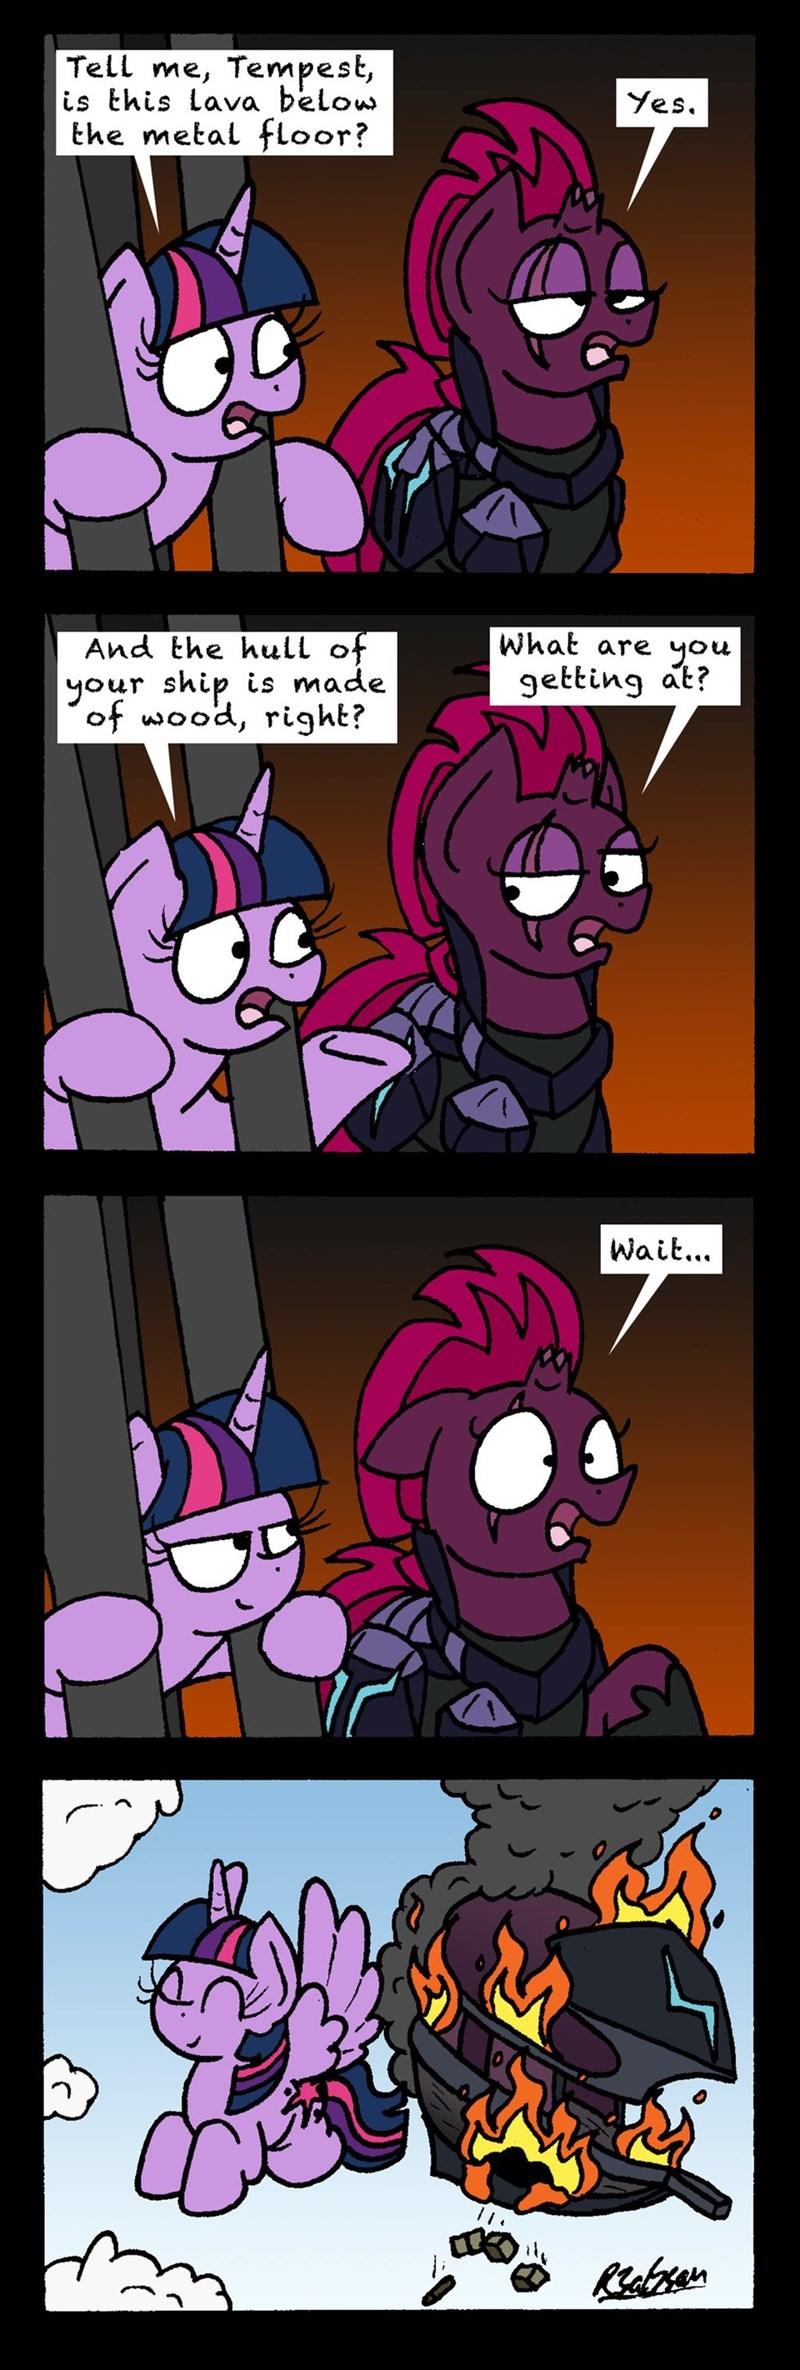 tempest shadow my little pony the movie bob the dalek twilight sparkle comic - 9131660288